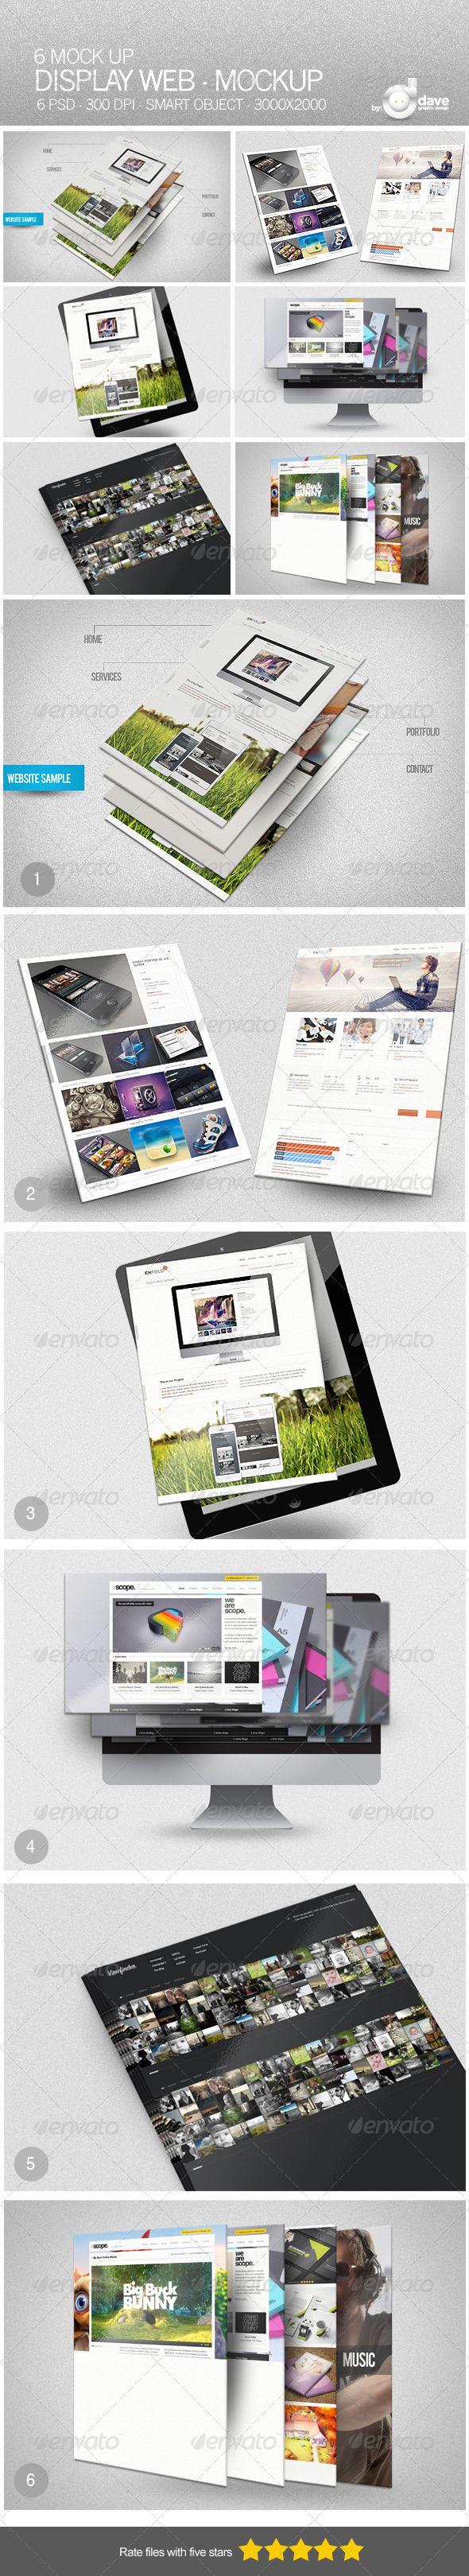 Display Web Mockup Web Mockup Mockup Design Mockup